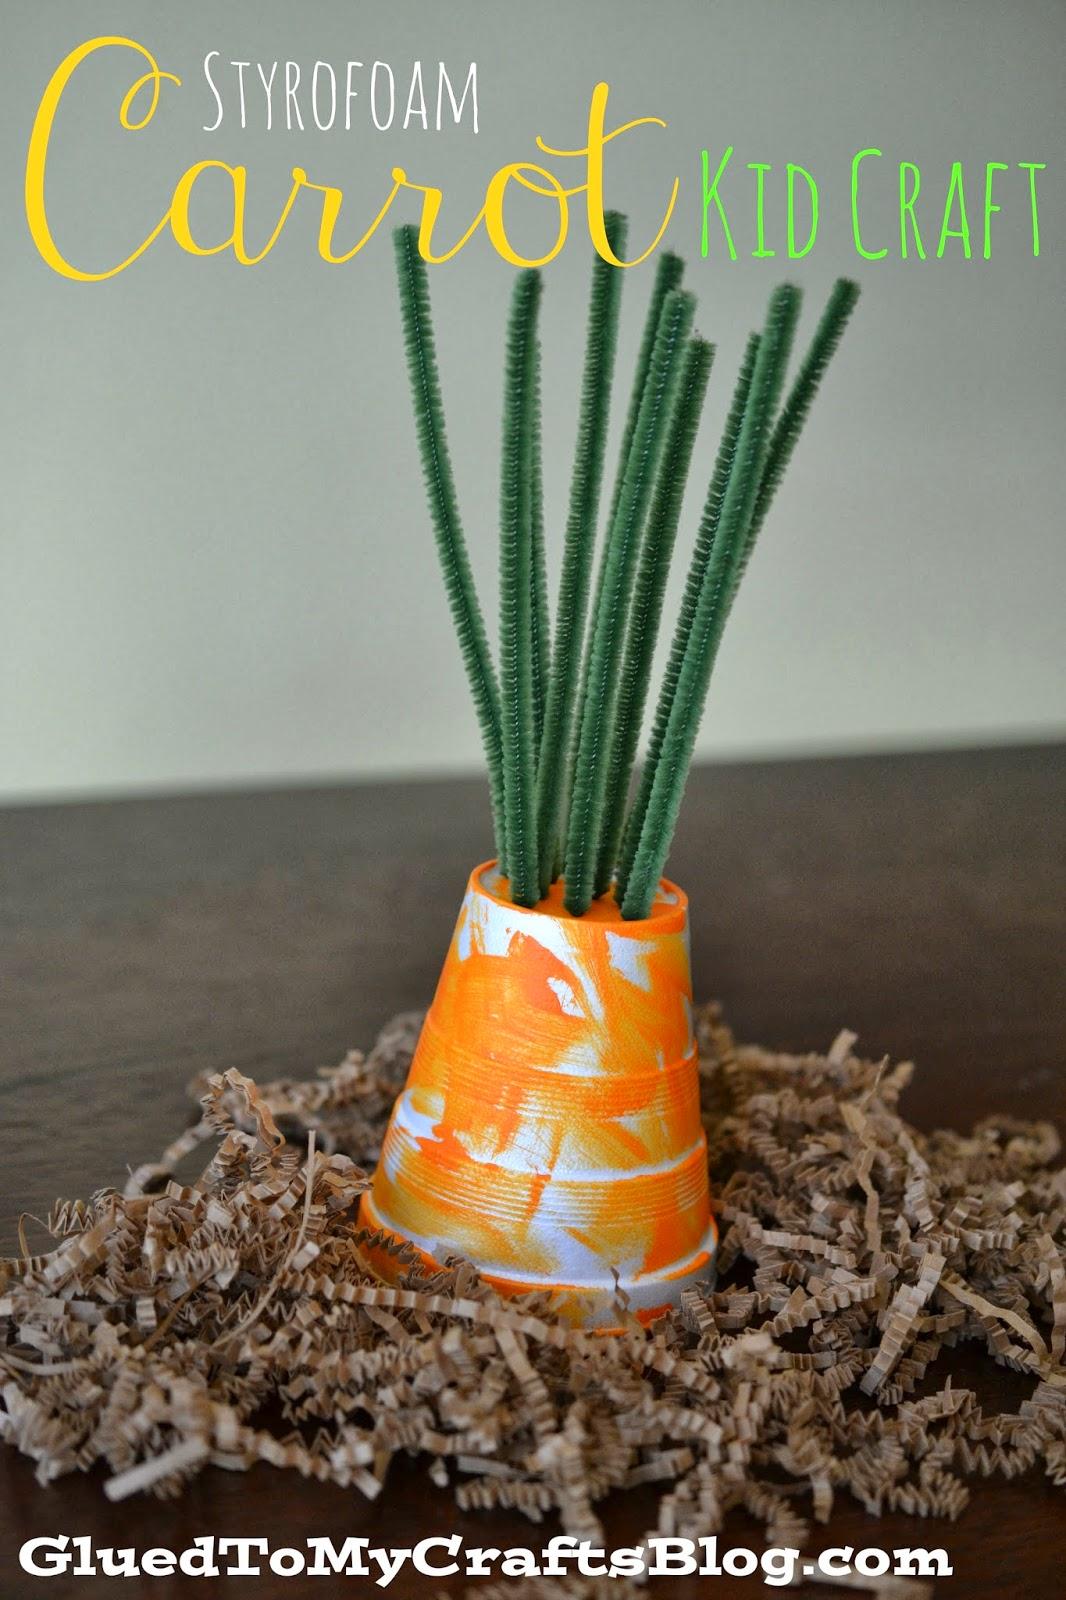 Styrofoam Cup Carrot - Spring Kid Craft Idea